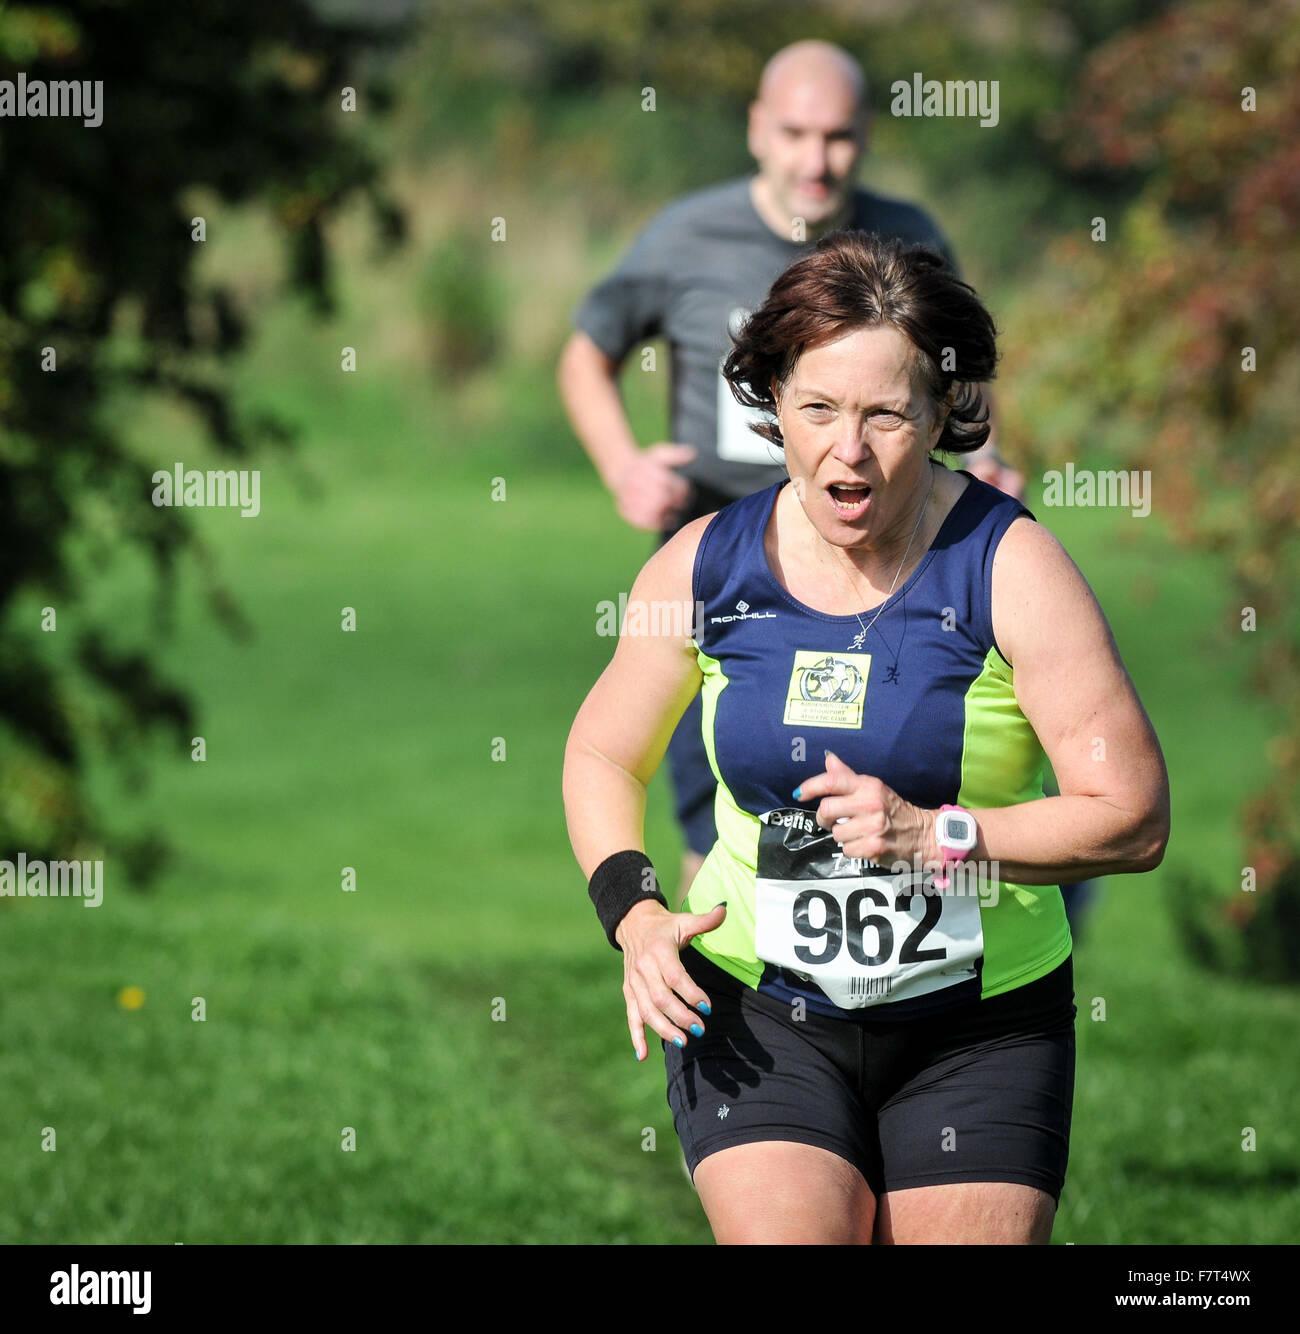 Pattingham Bells Run 2015 near the finish line of the 7 mile cross country run held in Pattingham, Codsall, Staffordshire, - Stock Image